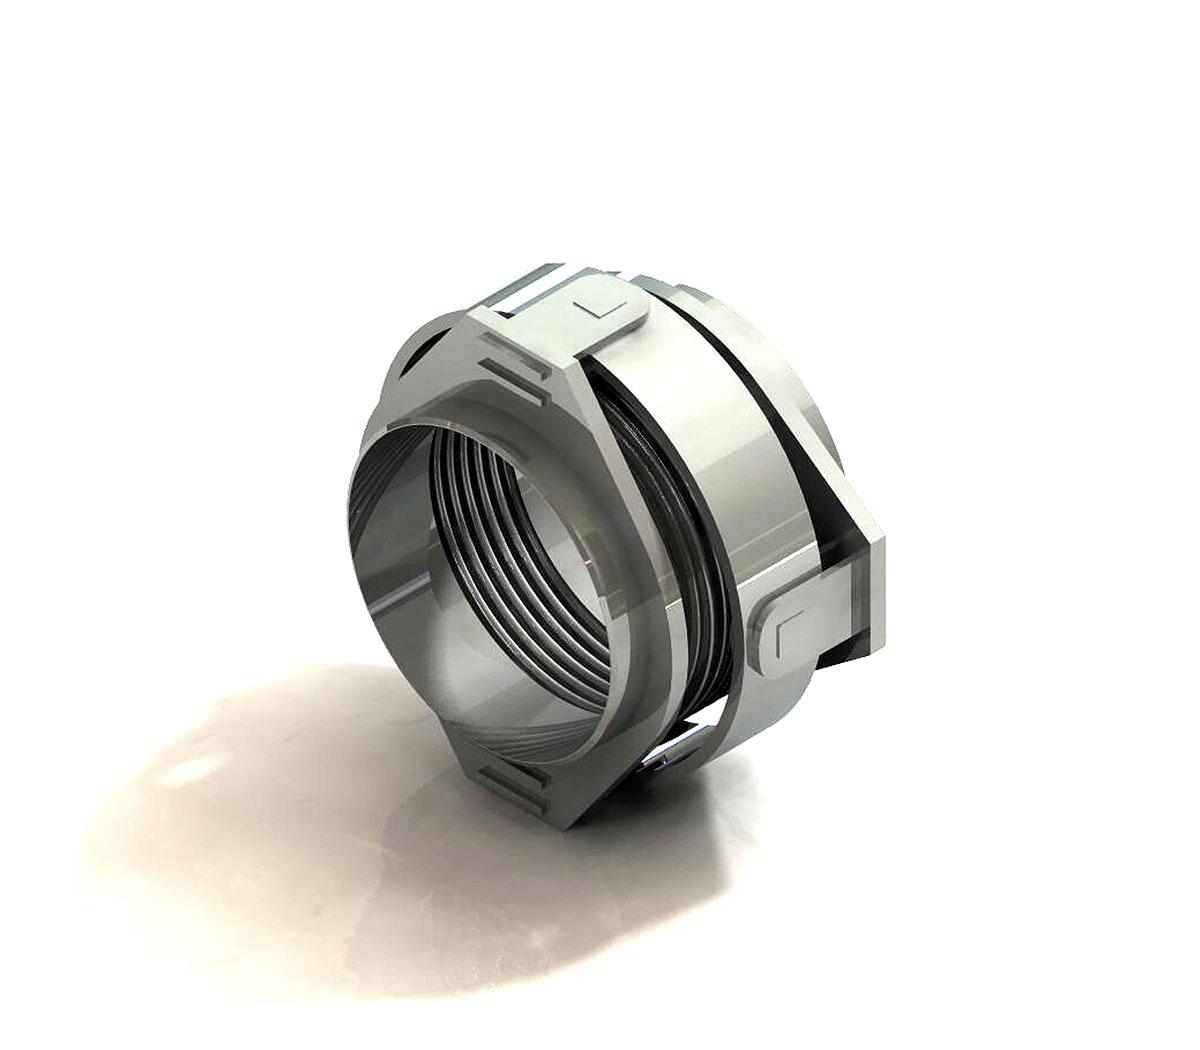 Compensador MWC articulado Rotula c/pontas de soldar